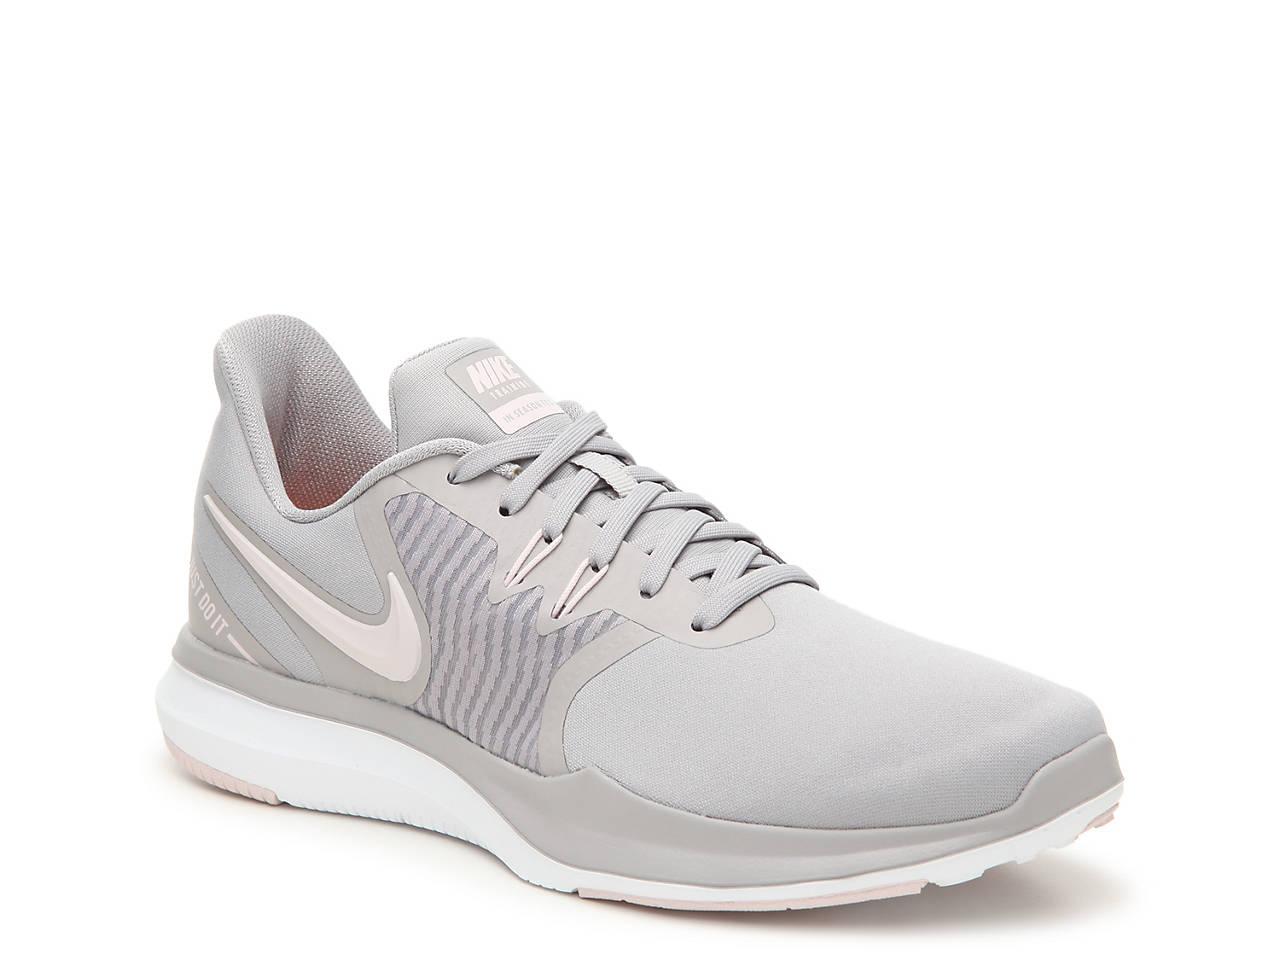 Nike In Season TR8 Lightweight Training Shoe - Women s Women s Shoes ... fbe8e53c1